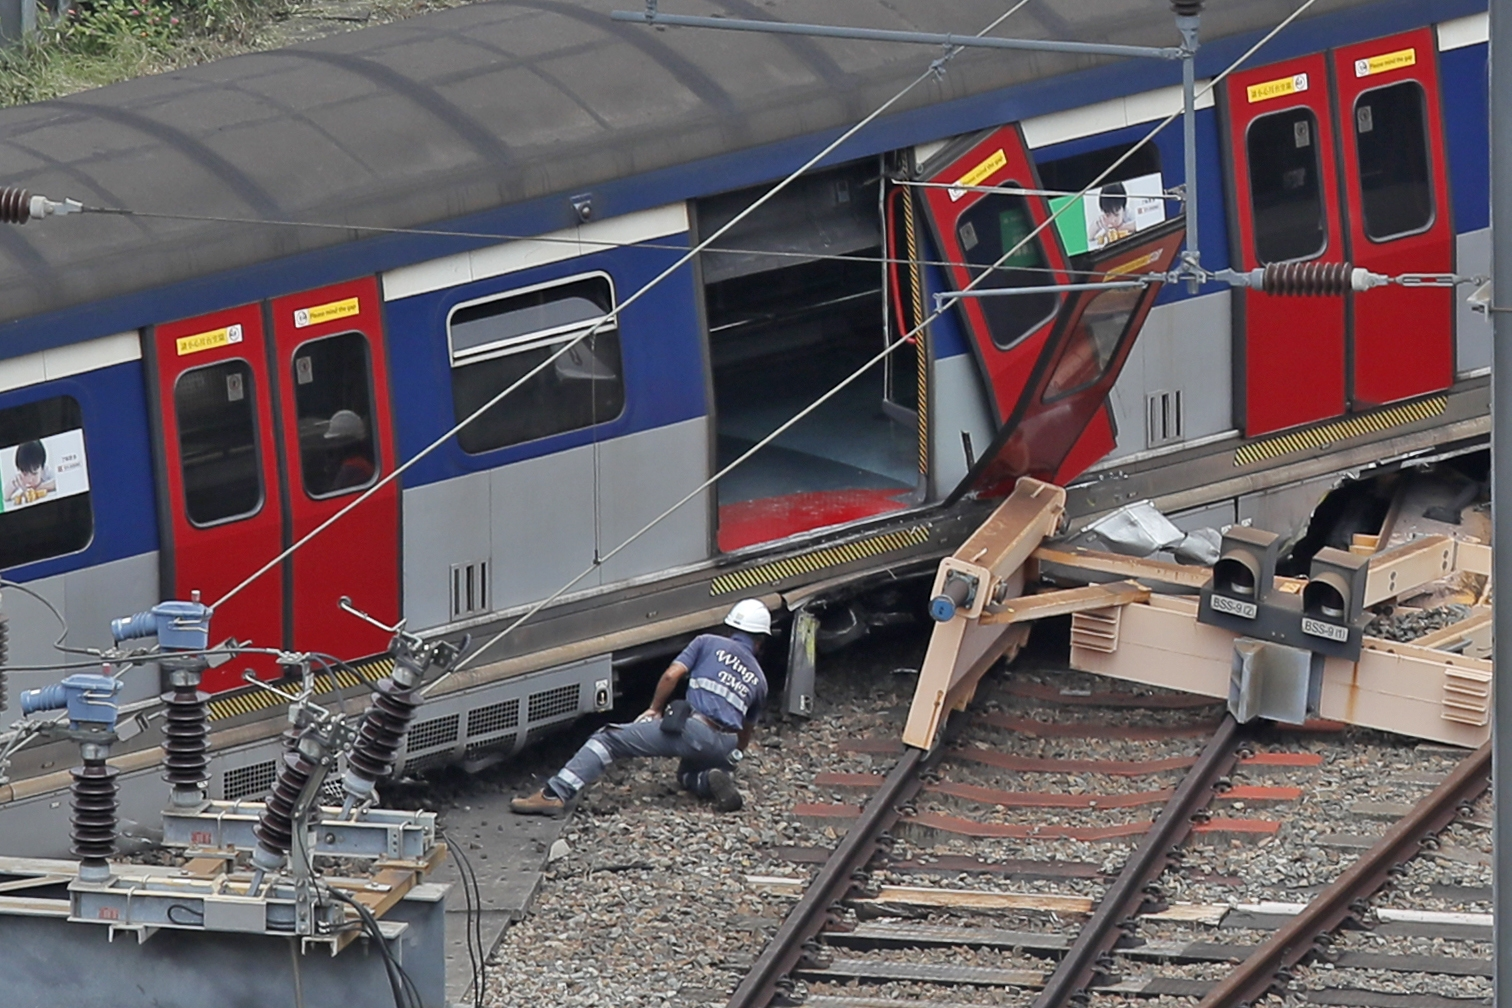 8 Injured as Passenger Train Derails In Hong Kong During Rush Hour